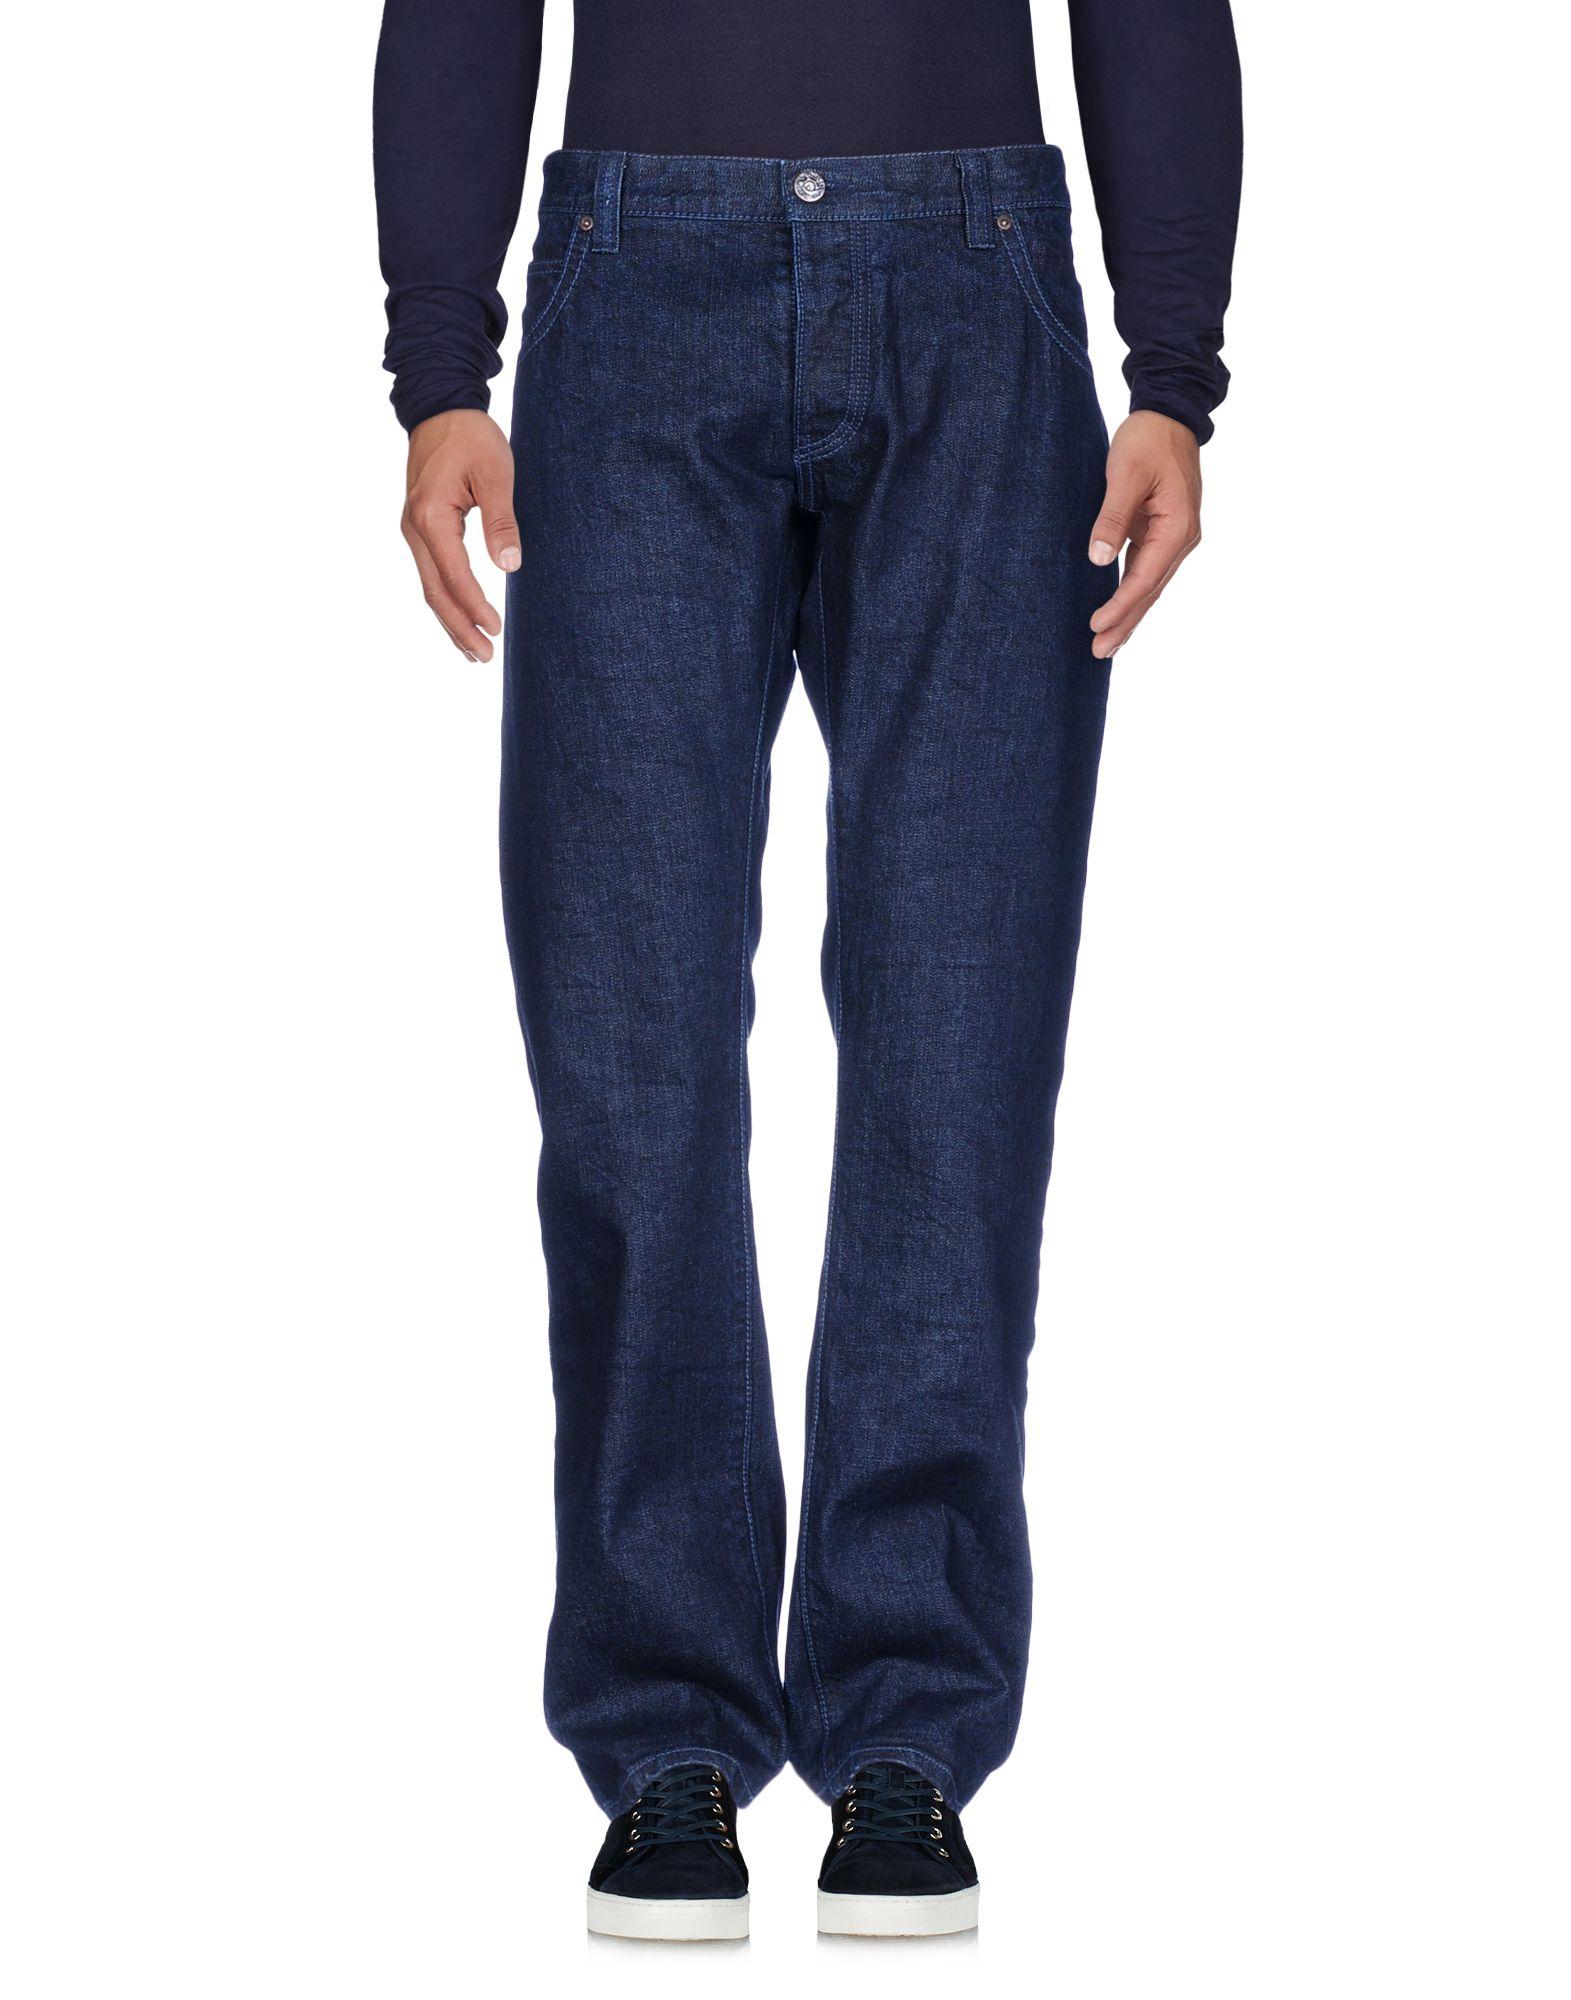 Pantaloni Pantaloni Pantaloni Jeans Armani Jeans uomo - 42679395JA 779